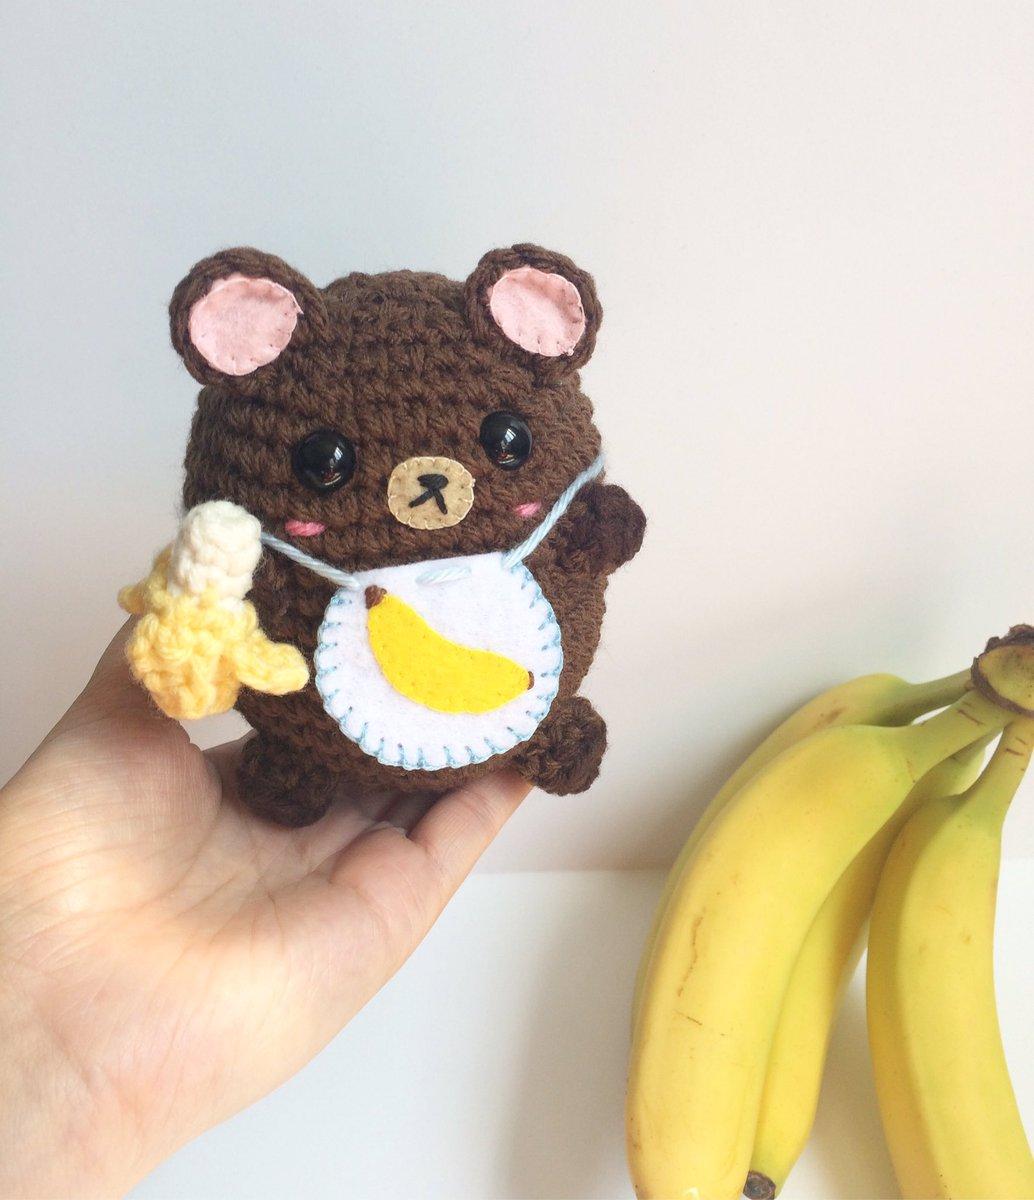 Hey #HandmadeHour I hope you enjoy my latest commission piece: Banana Baby Bear!   http:// marchoftheblacksheep.etsy.com  &nbsp;   #CraftHour #crochet #Etsy #cute<br>http://pic.twitter.com/vwvAJF4ef6